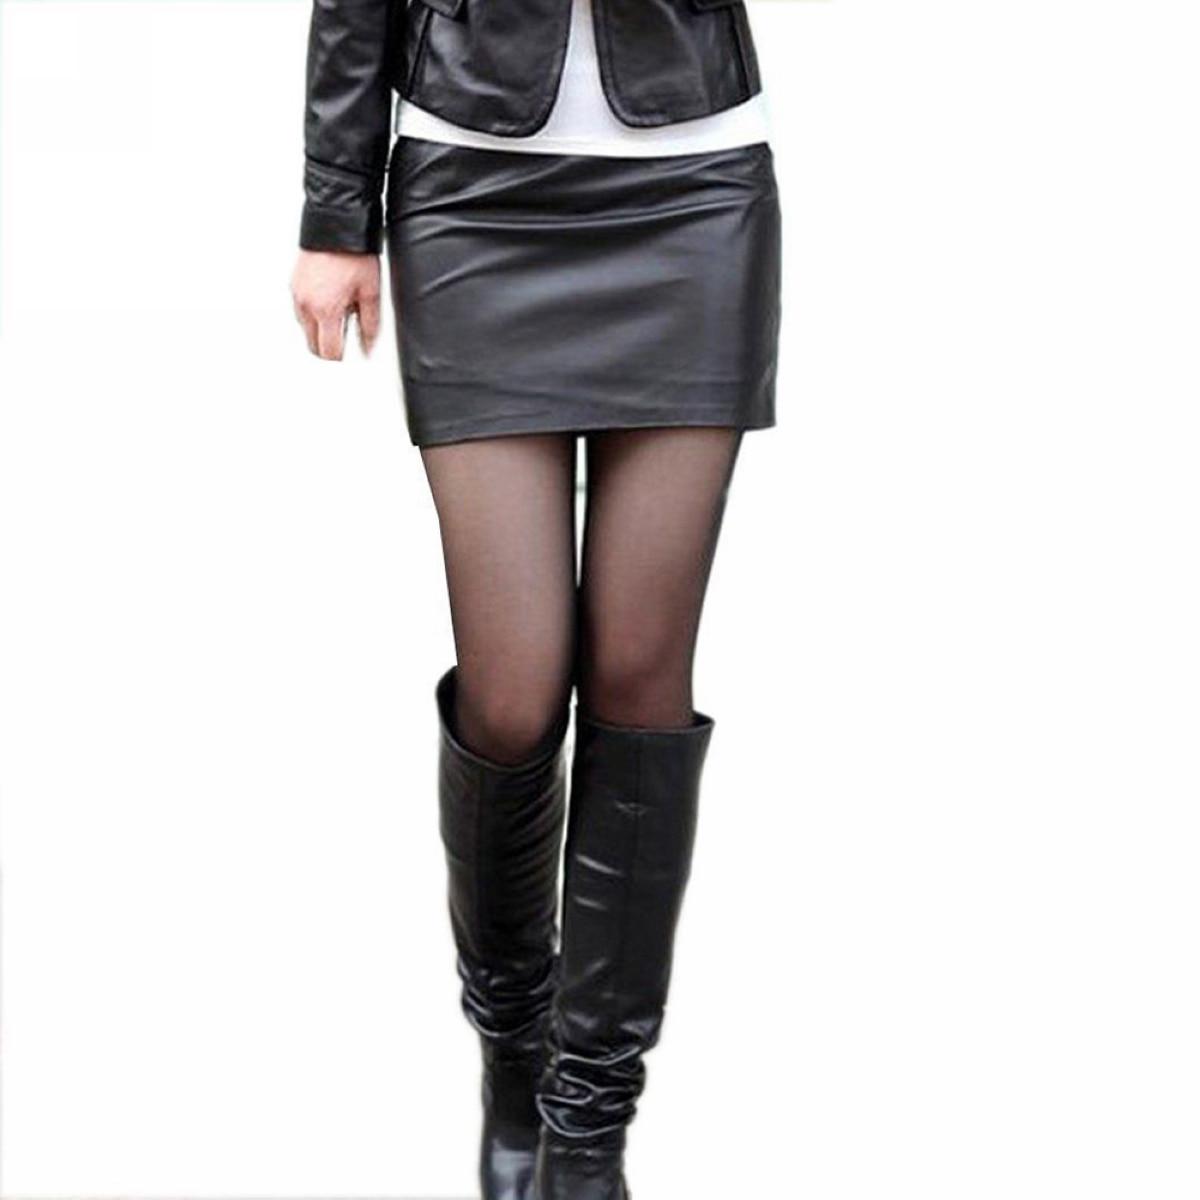 Skirt Womens Sexy Soft PU Leather High Waist Slim Pencil Bodycon Mini Skirt Lady Tight Stretch Korean OL Skirts Jupe Femme